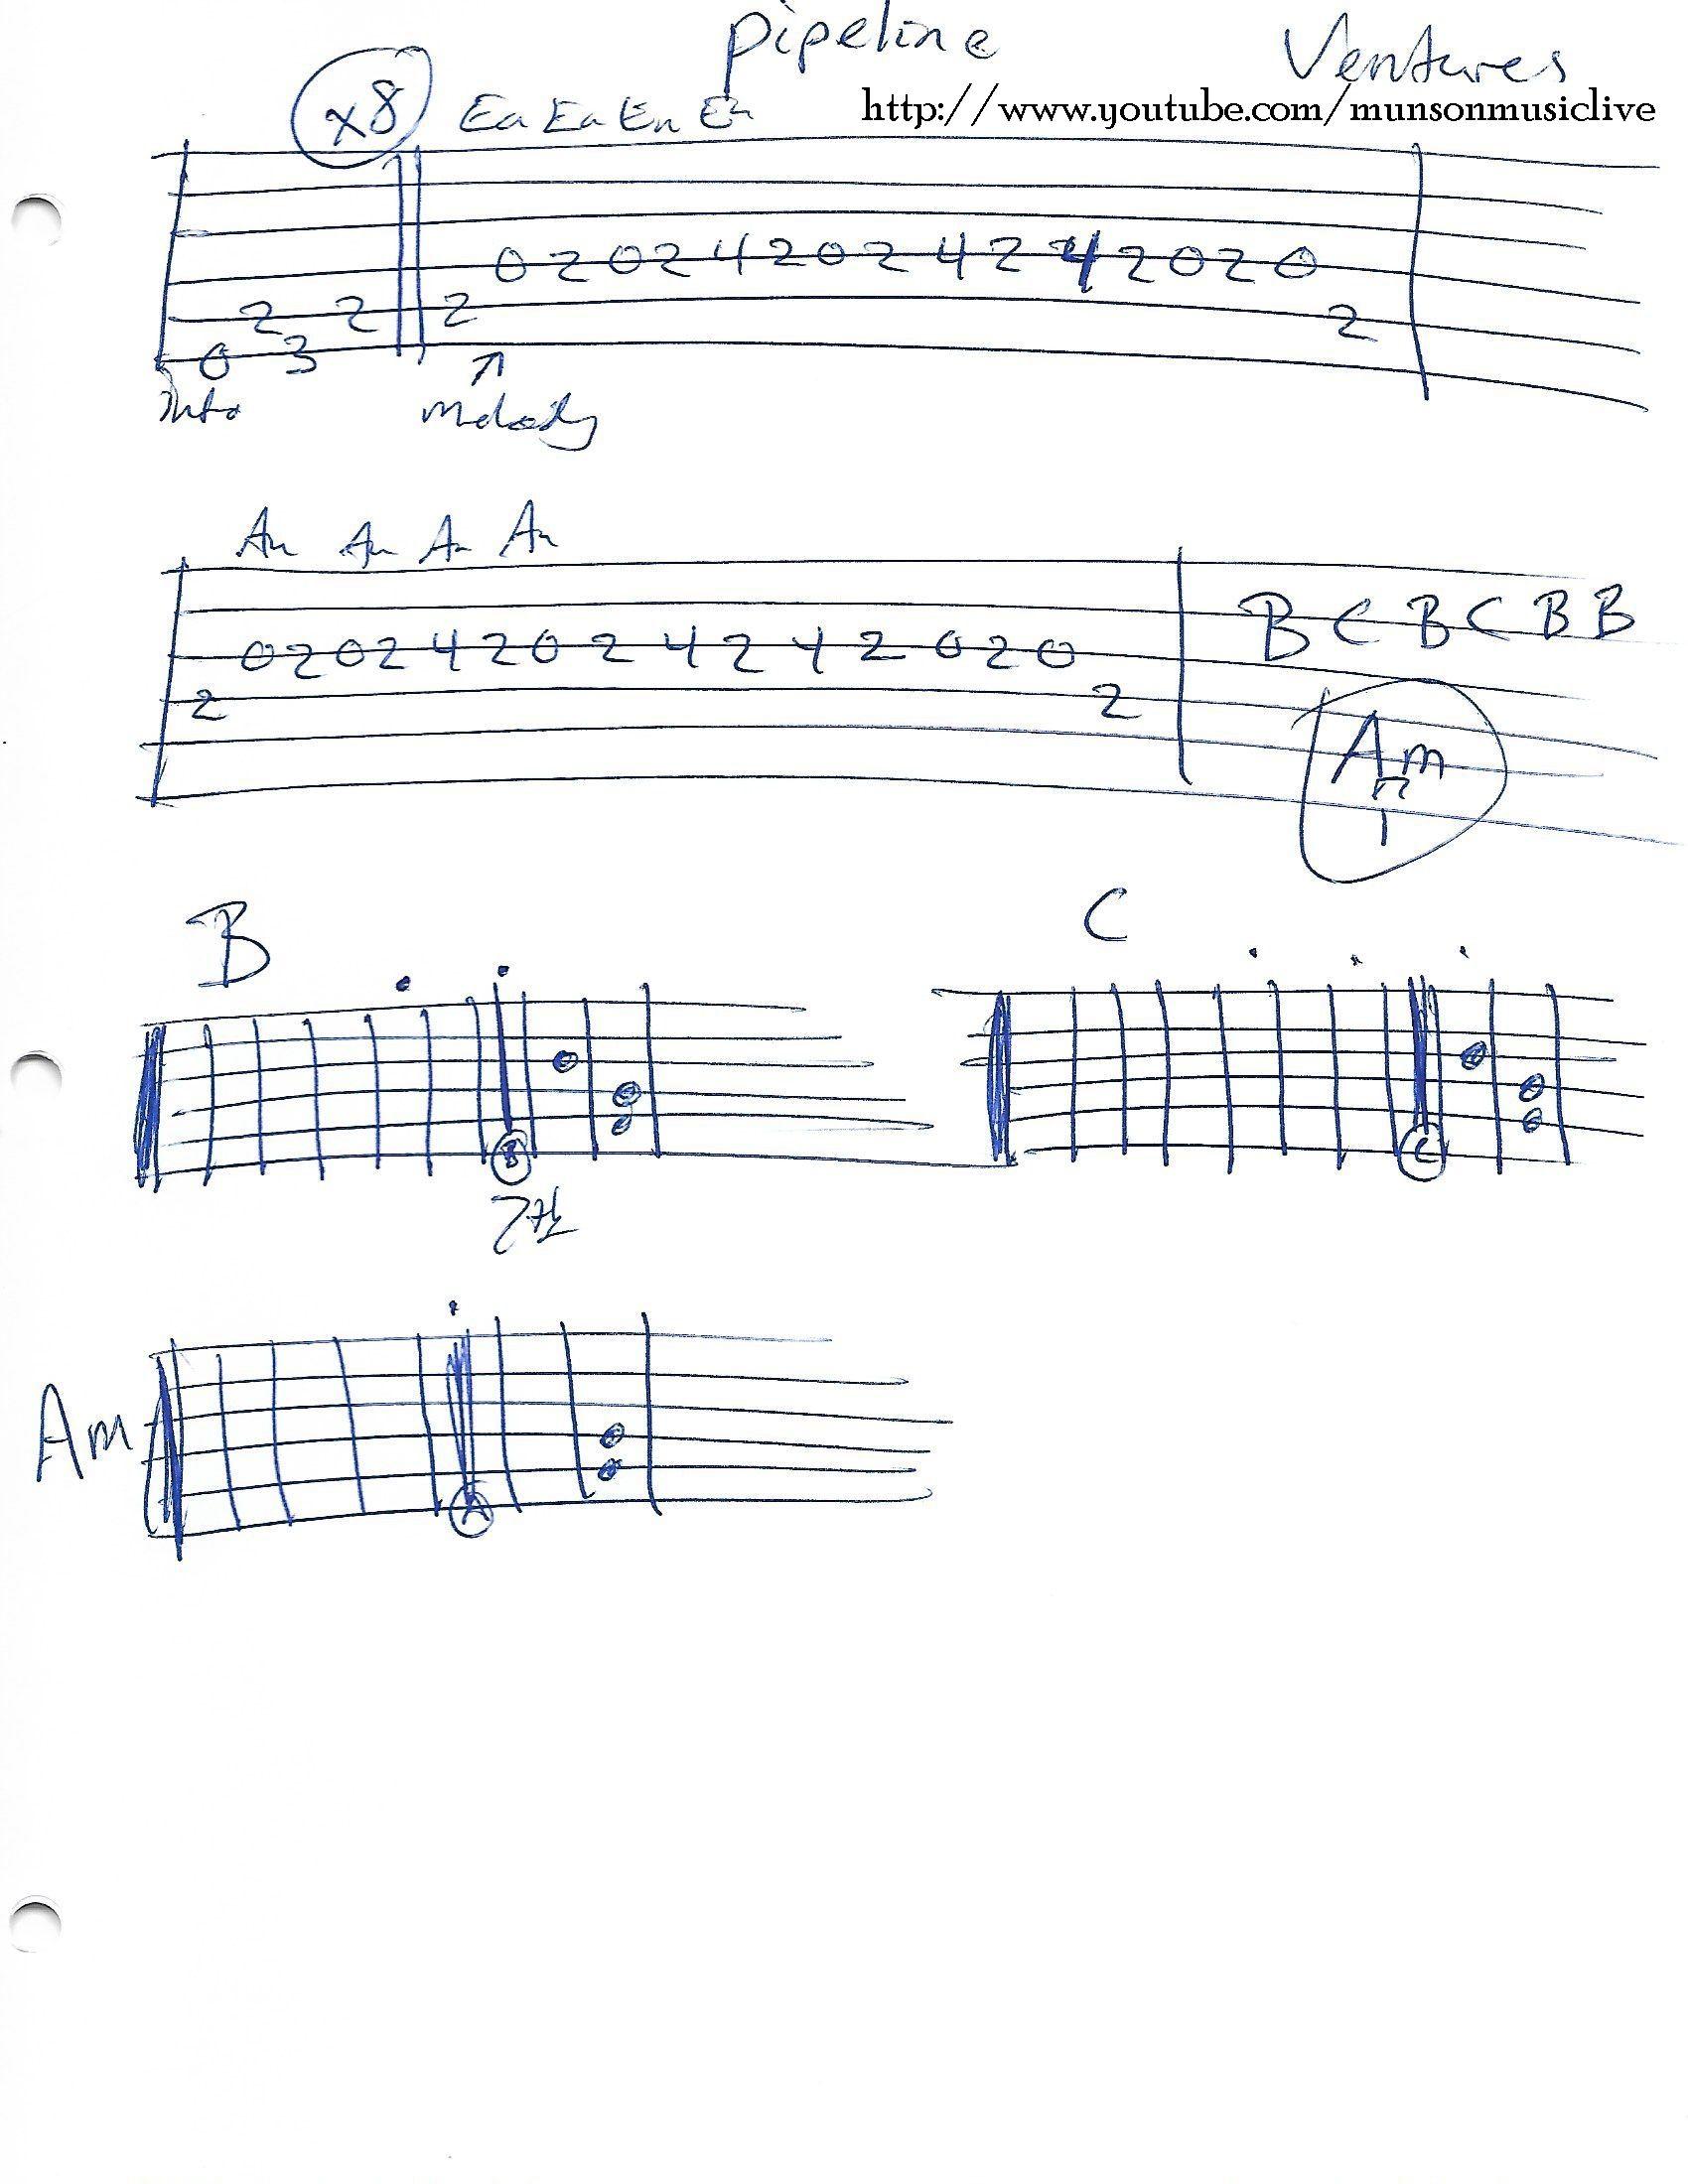 Pipeline Ventures Guitar Chord Chart Guitar Lesson Chord Charts